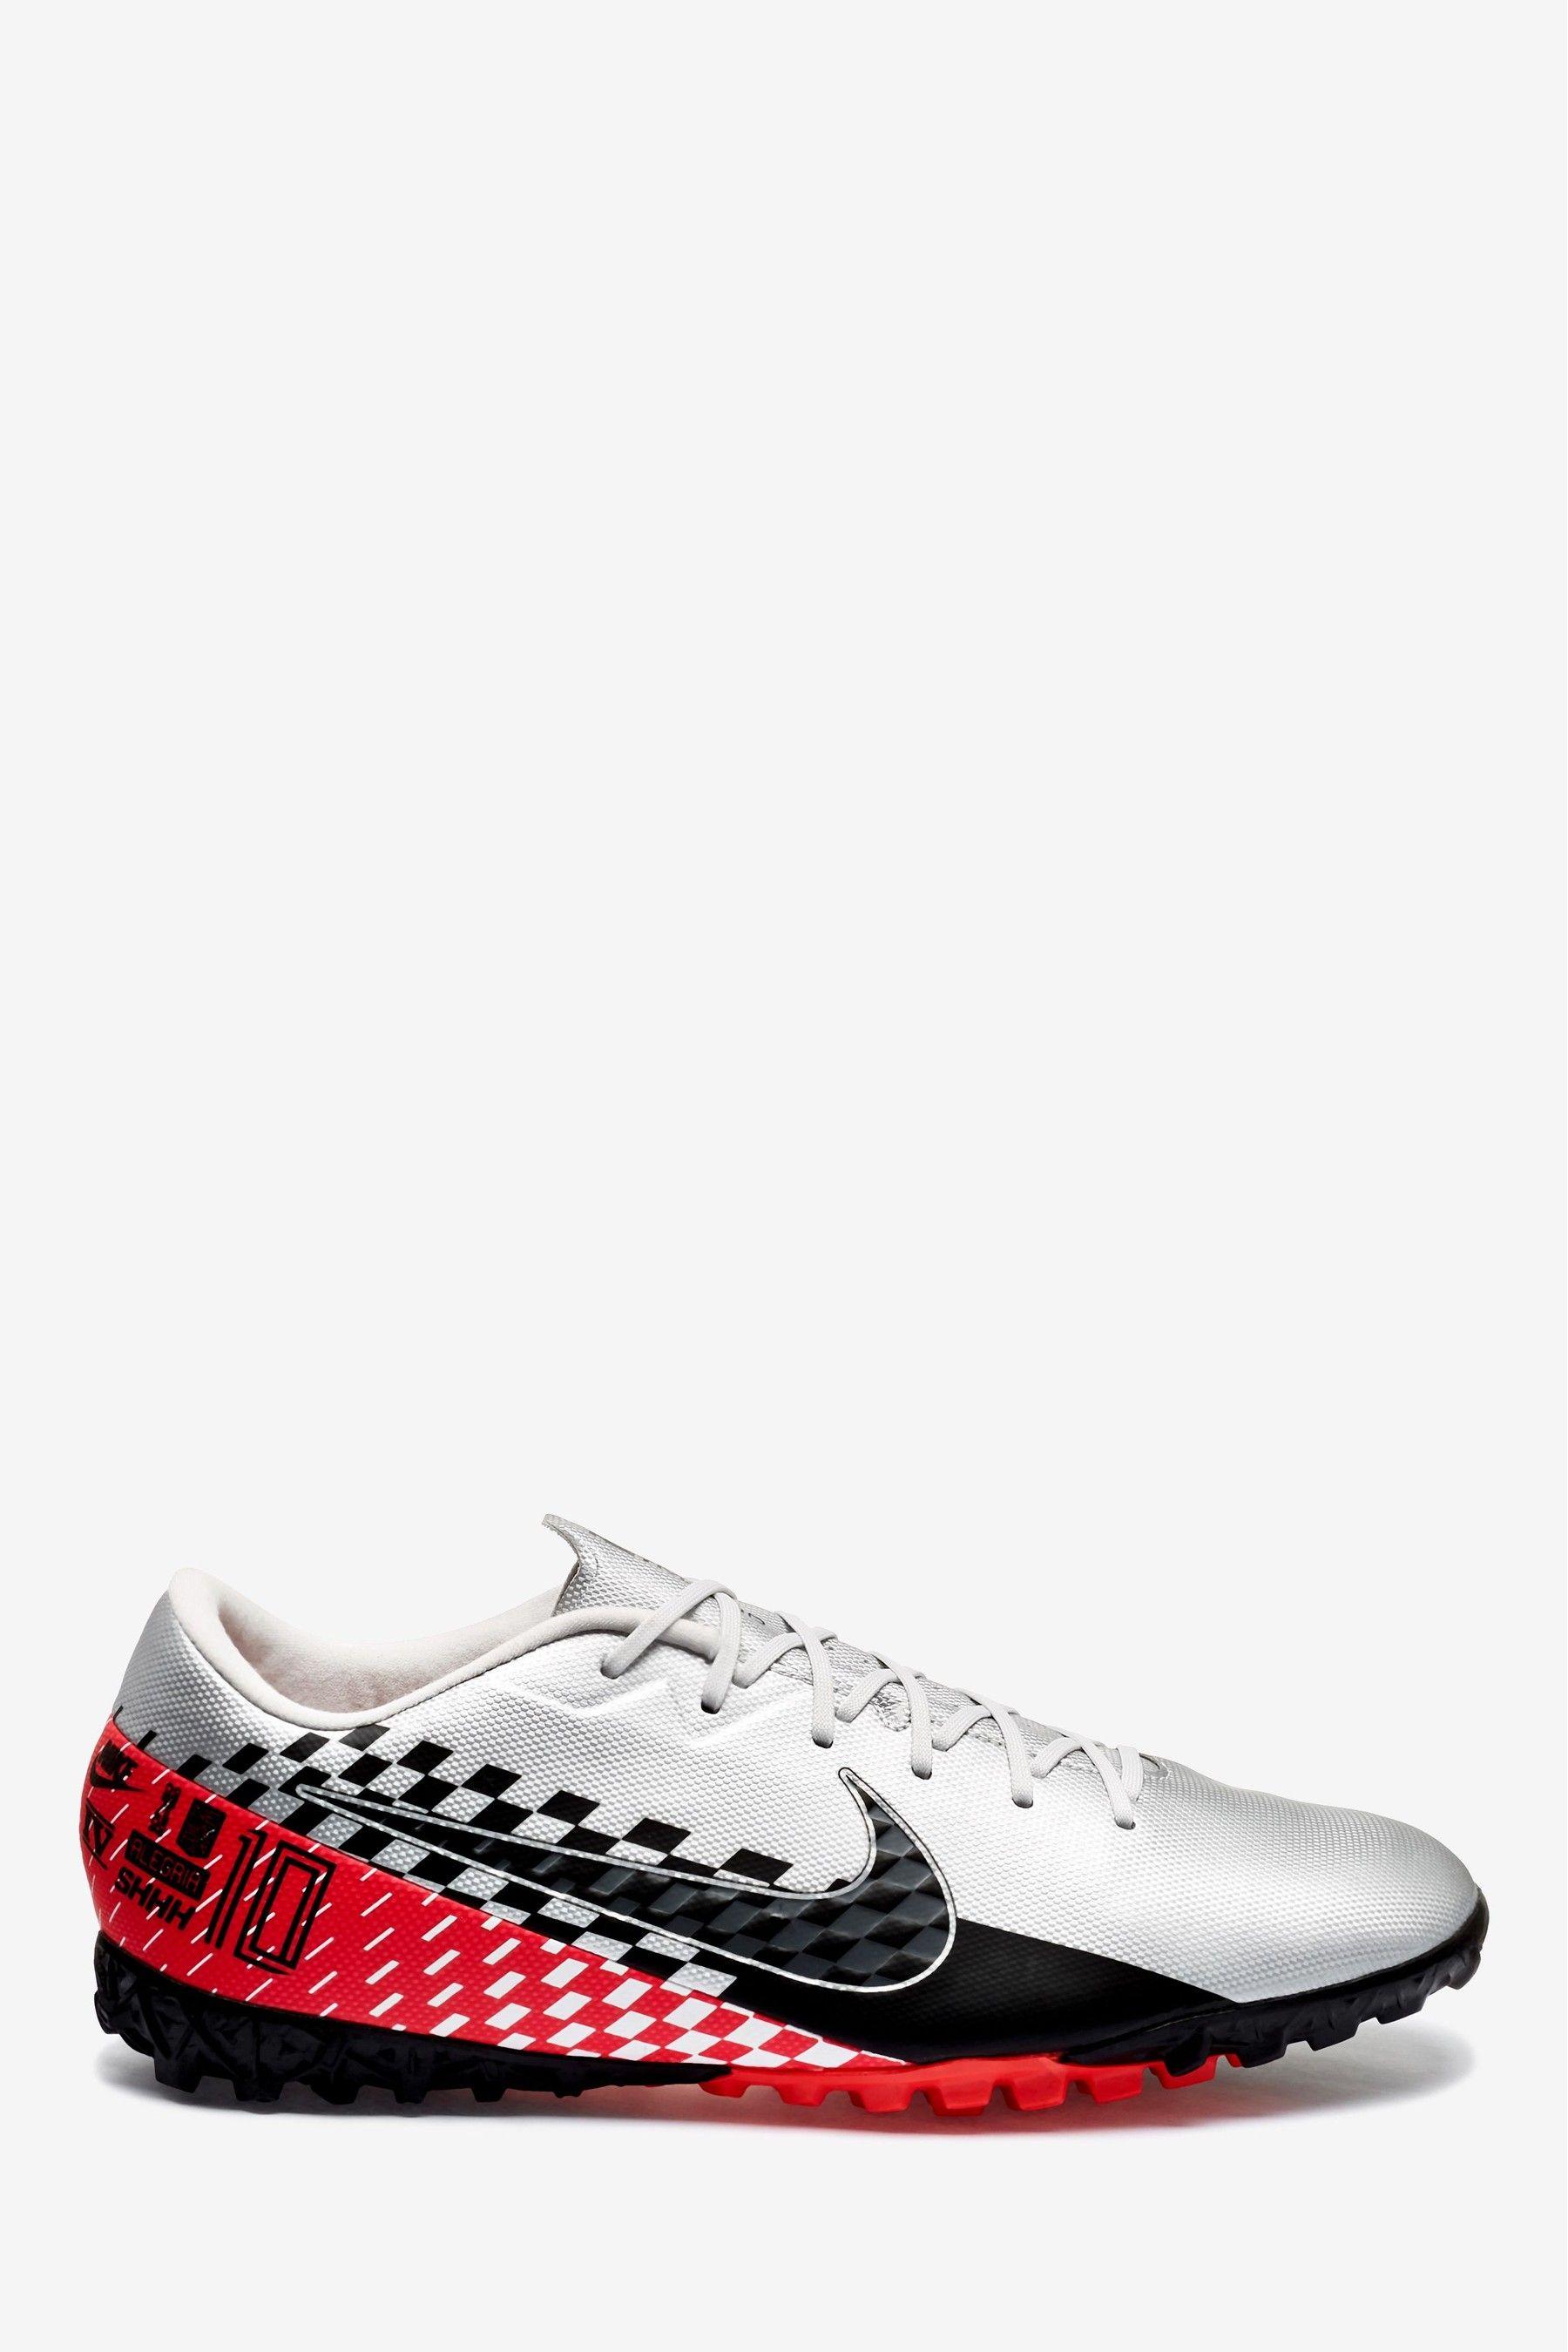 Mens Nike Chrome Neymar Vapor Academy Turf Football Boots Grey Football Boots Nike Neymar